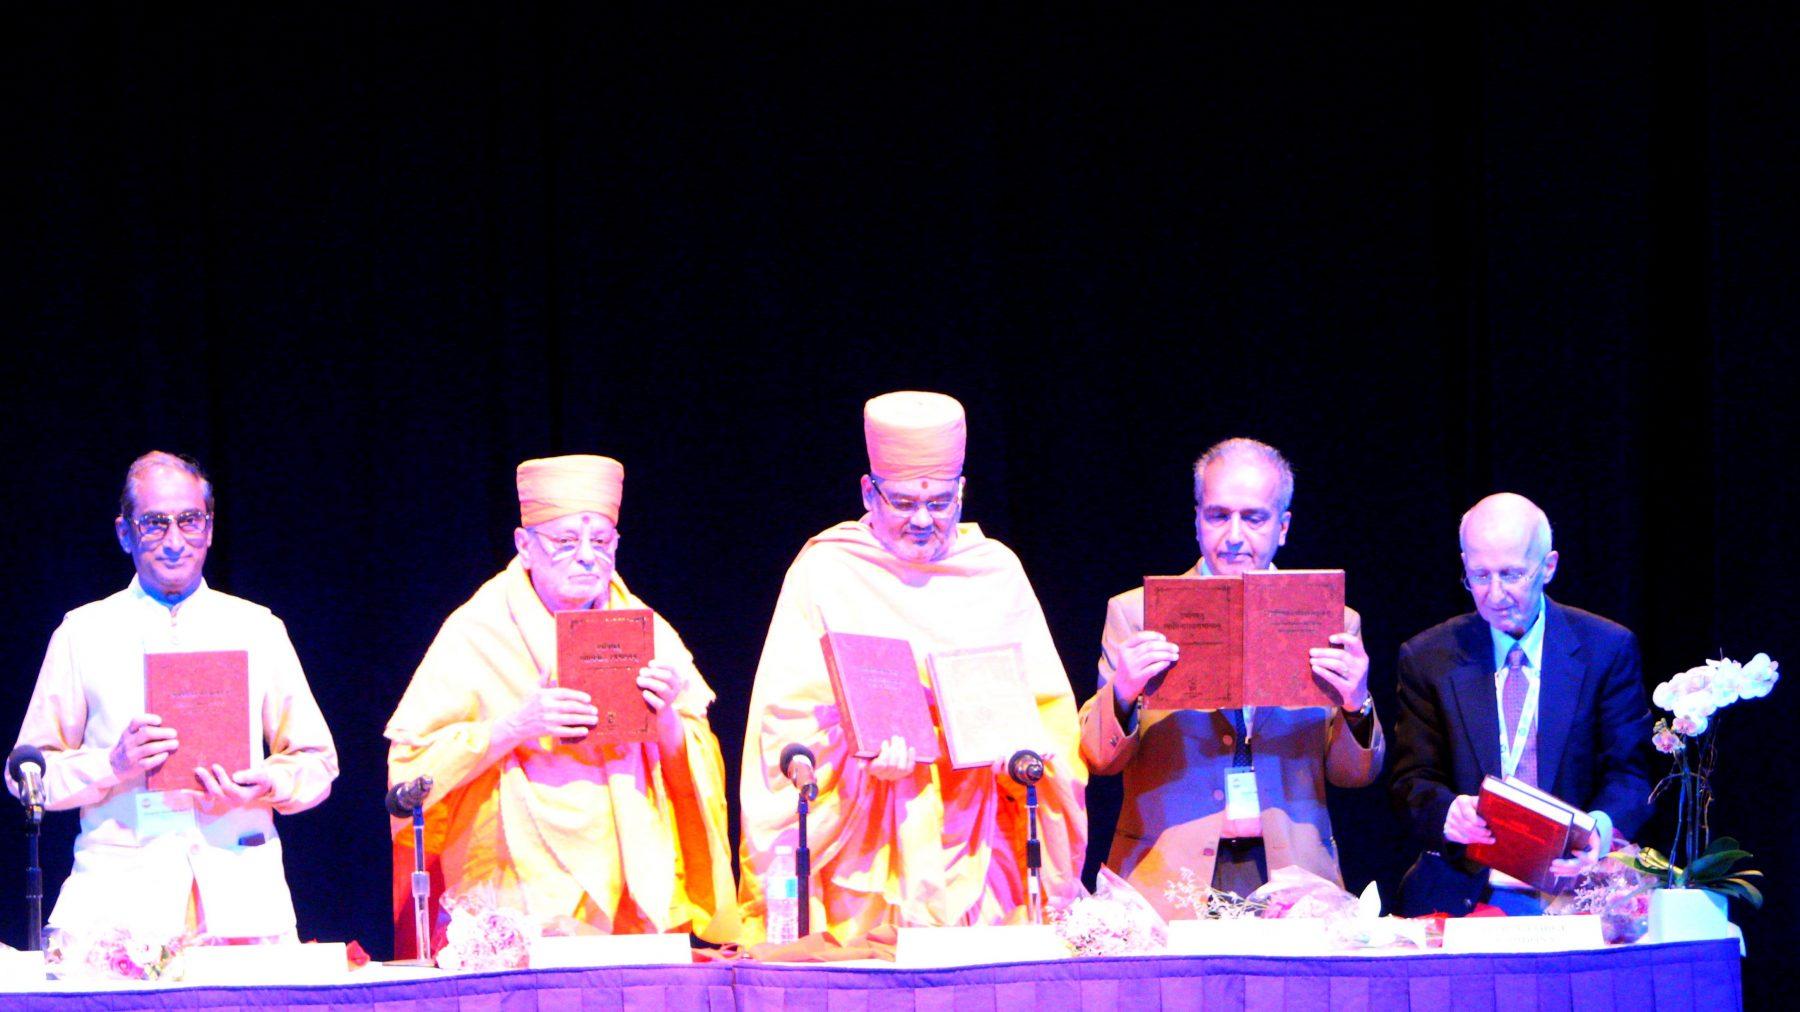 Bhagwan Swaminarayan's Akshar-Purushottam Darshan being recognized as distinct Vedanta tradition at the World Sanskrit Conference. Seen from Left to Right - V. Kutumba Shastry (President, International Association of Sanskrit Studies. Head of Organizing Committee of World Sanskrit Conference), Sadguru Pujya Ishwarcharan Swami, Mahamahopadhyaya Bhadreshdas Swami, Prof. Ashok Aklujkar (Member World Sanskrit Conference Secretariat), Prof. George Cardona (University of Pennsylvania)